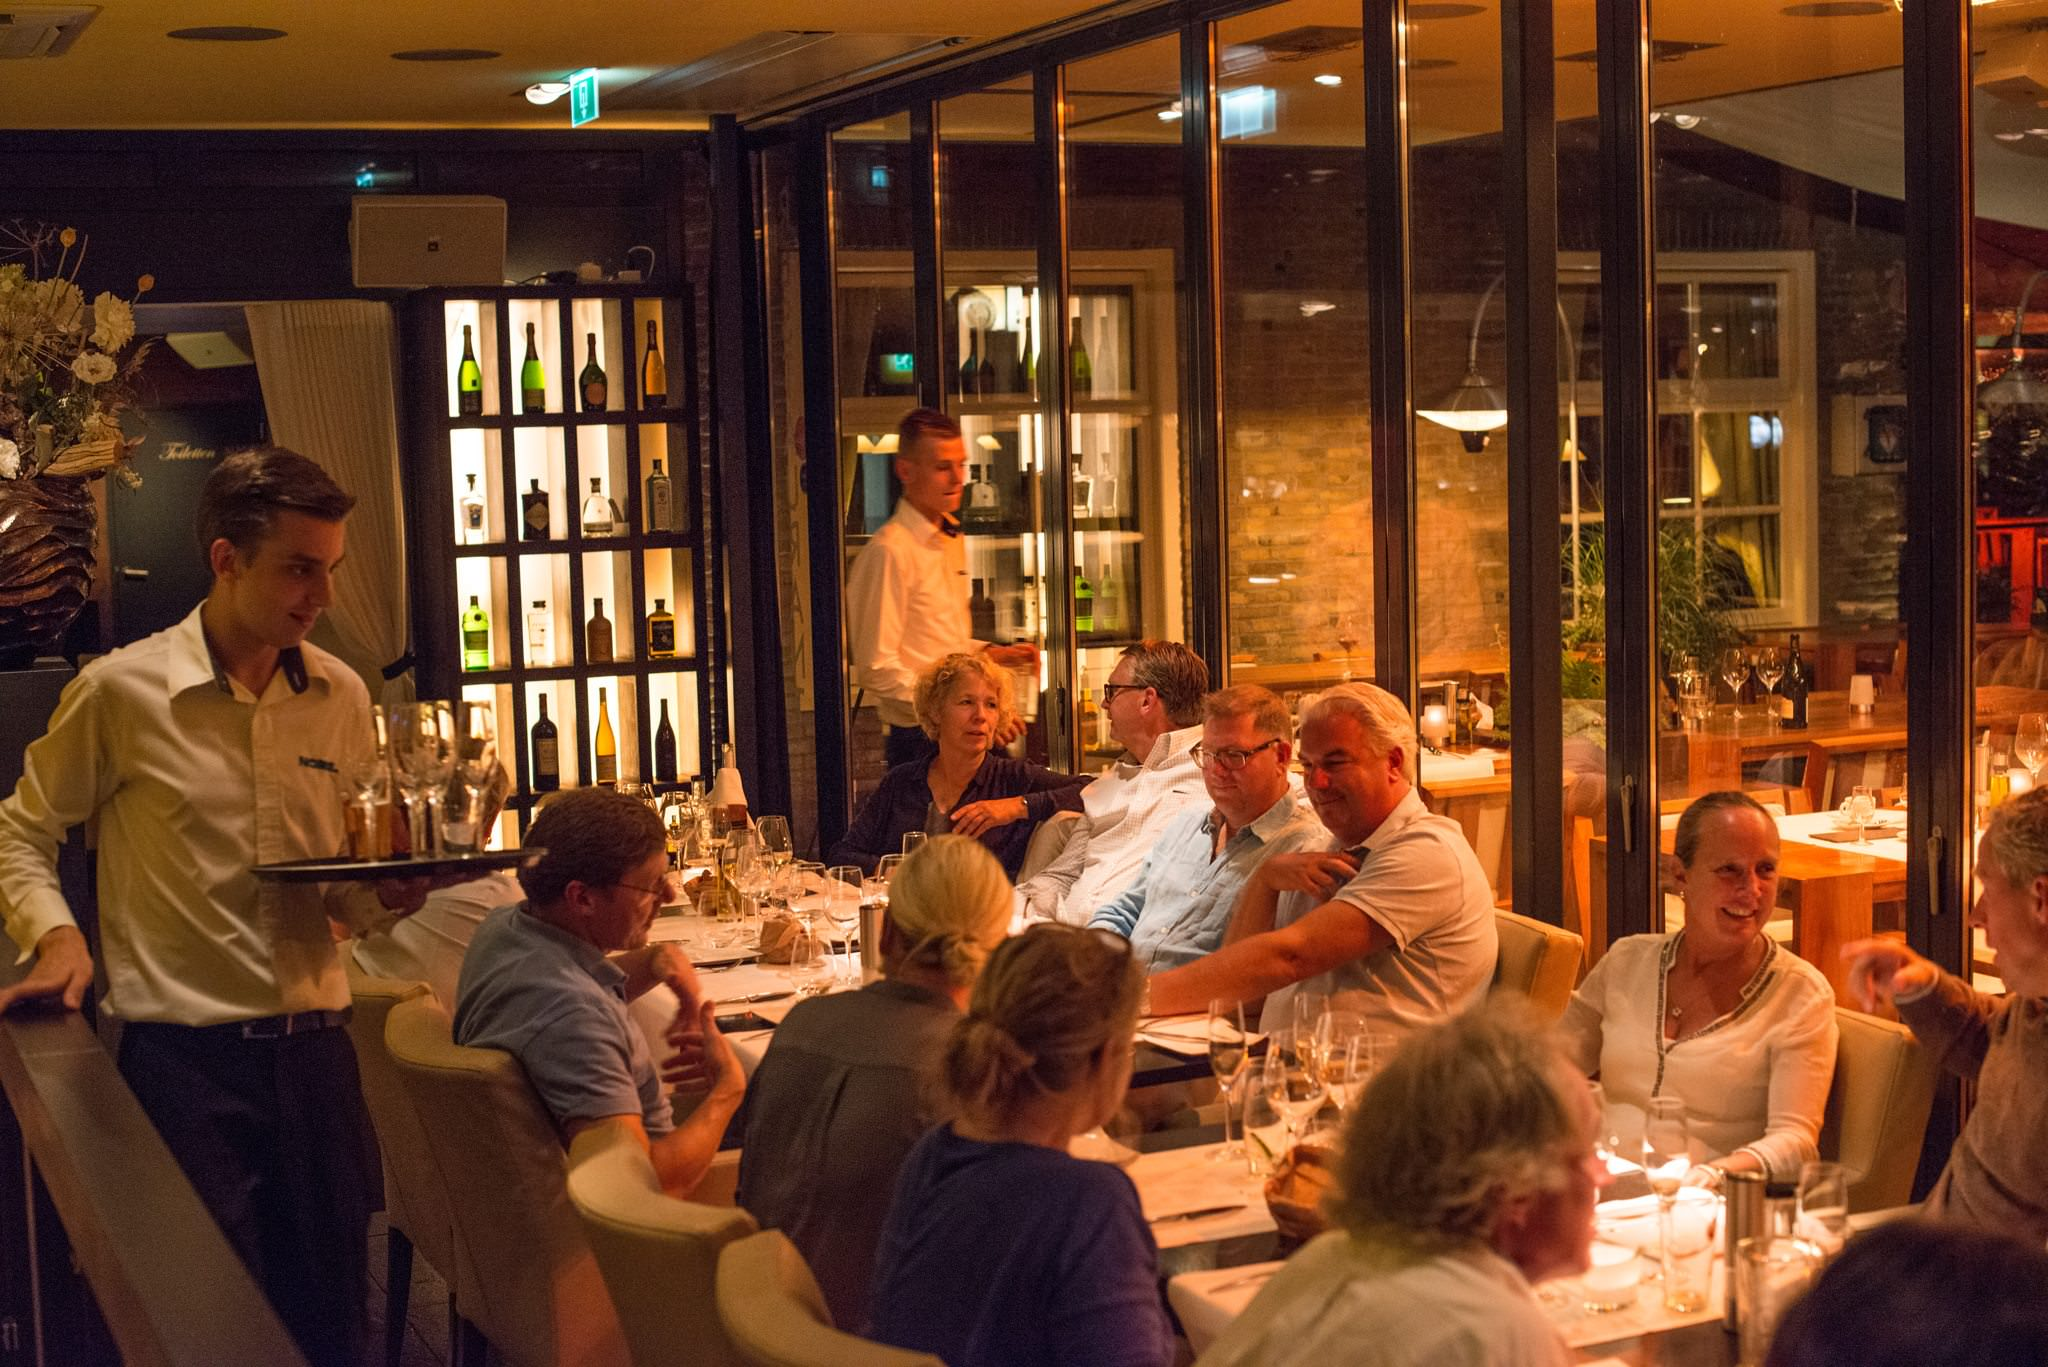 hotelnobel-galerij-restaurant-0002